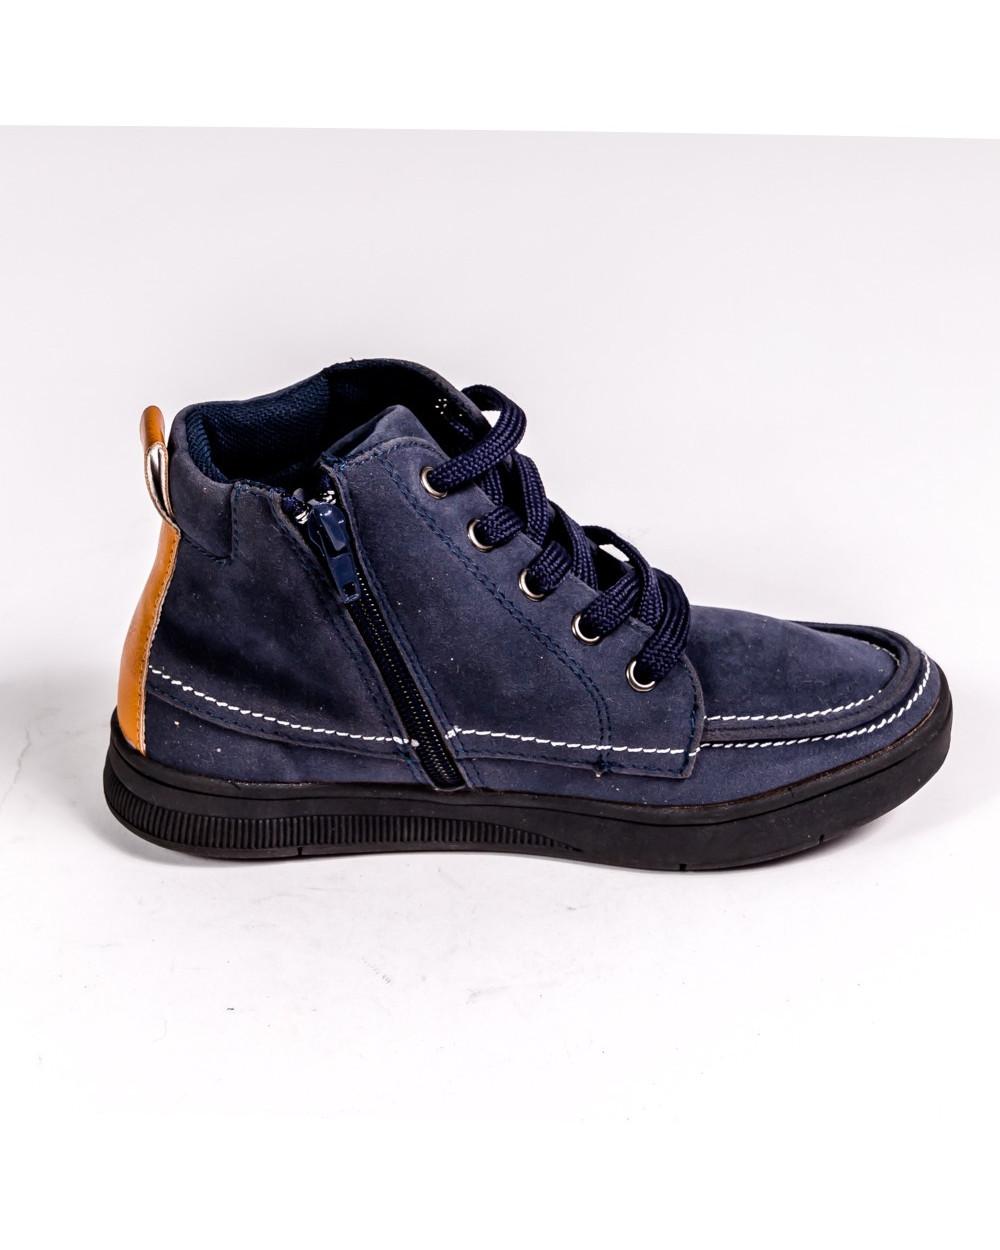 F. Twist Zapato Infantil Casual Niña/o E017